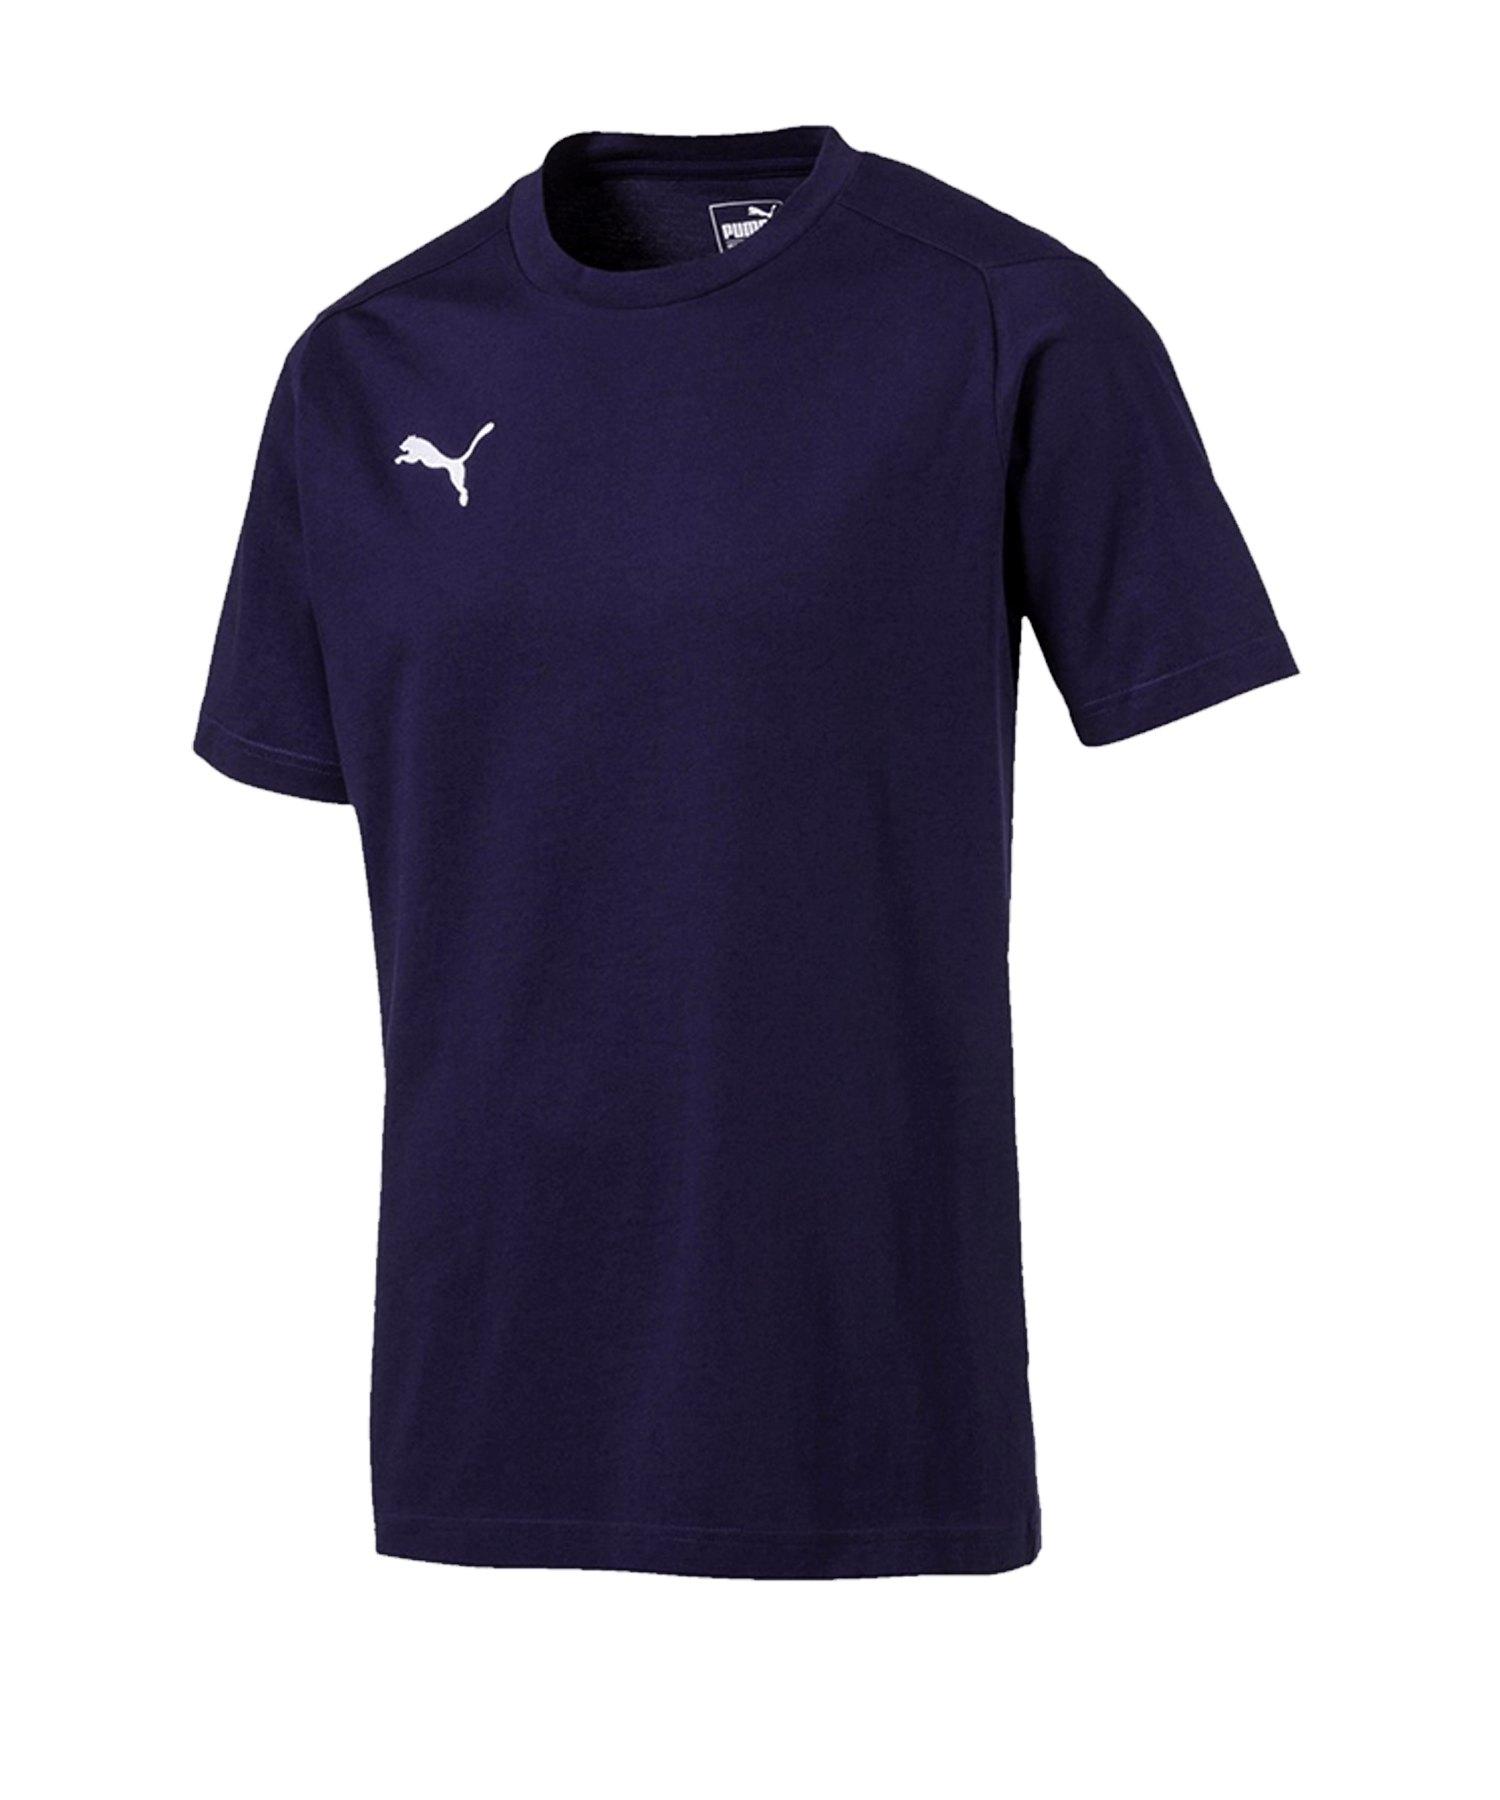 PUMA LIGA Casuals Tee T-Shirt Dunkelblau F06 - blau